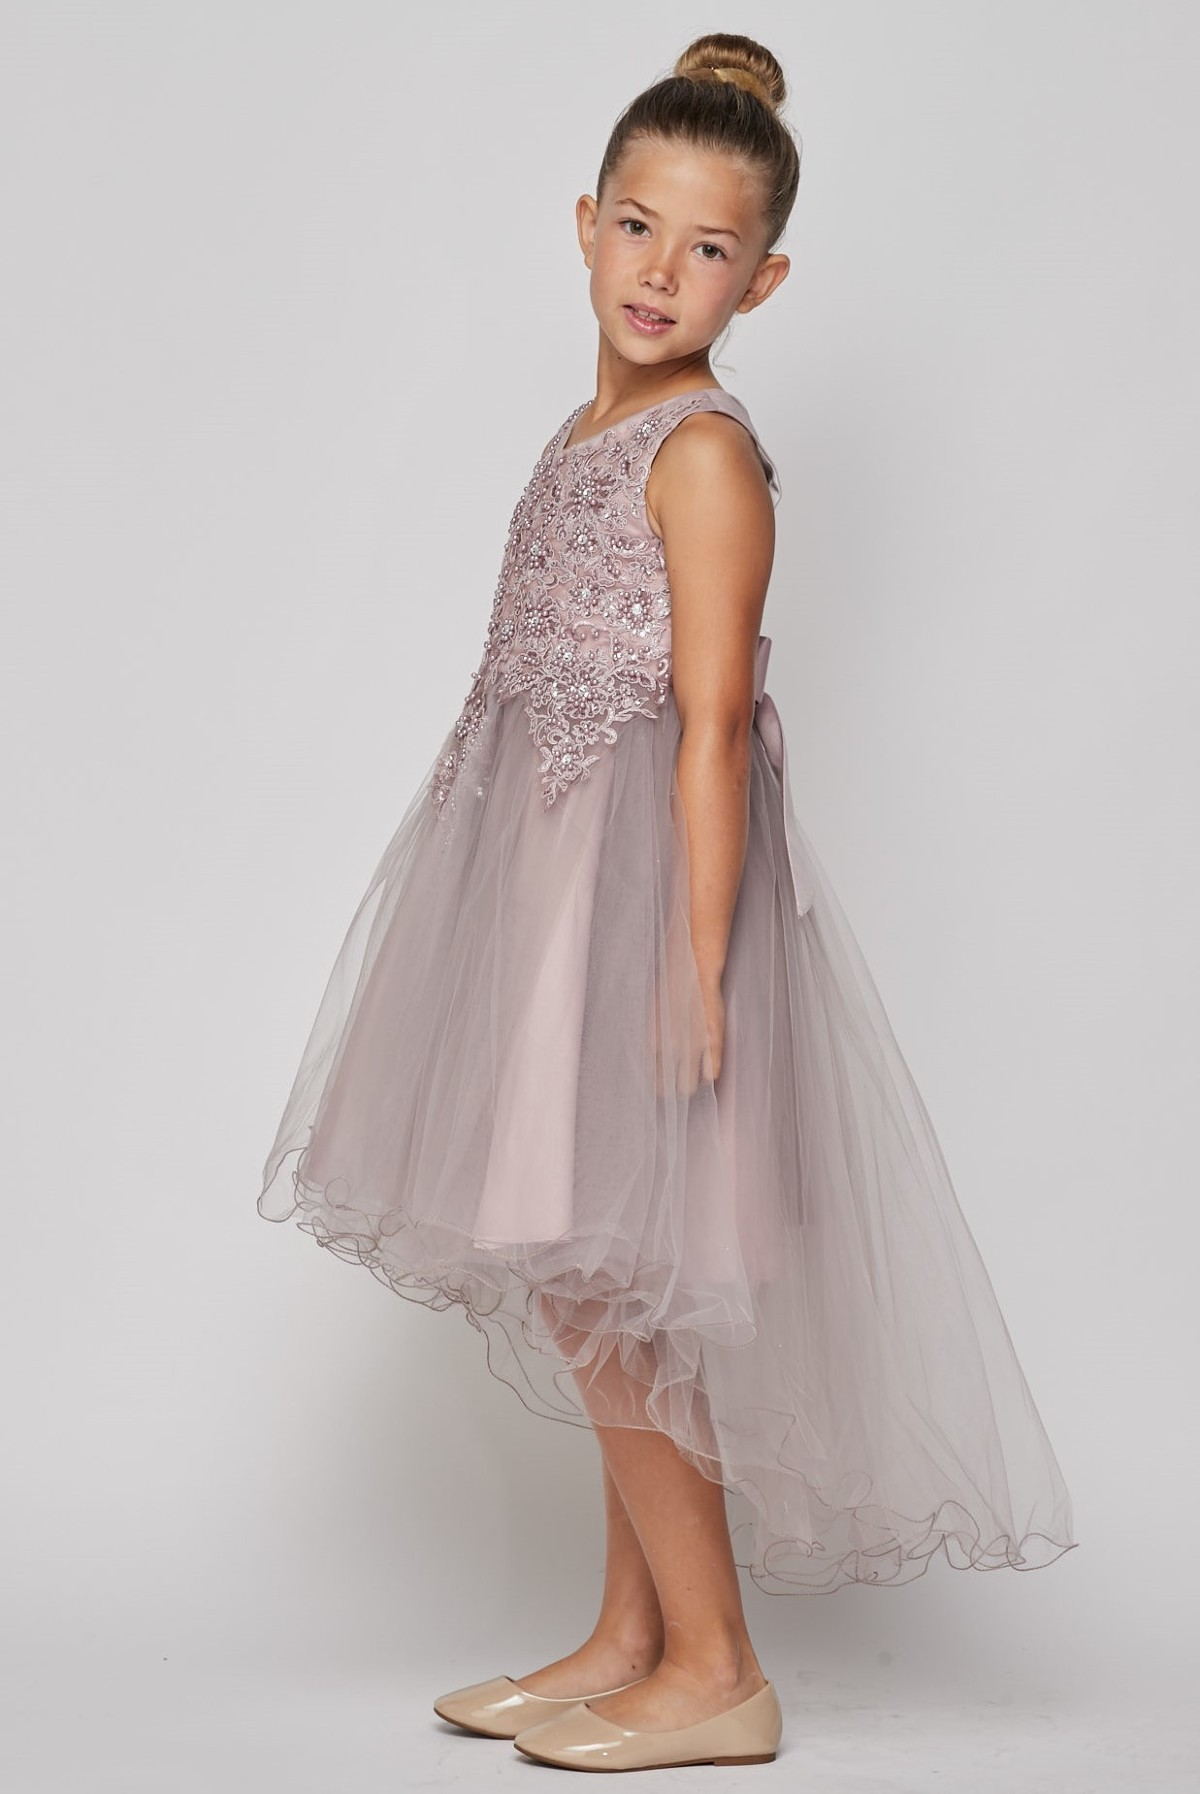 NEW Kid Flower Girl Pageant Graduation Prom Formal Dress Navy Blue SZ 3-10 Z57